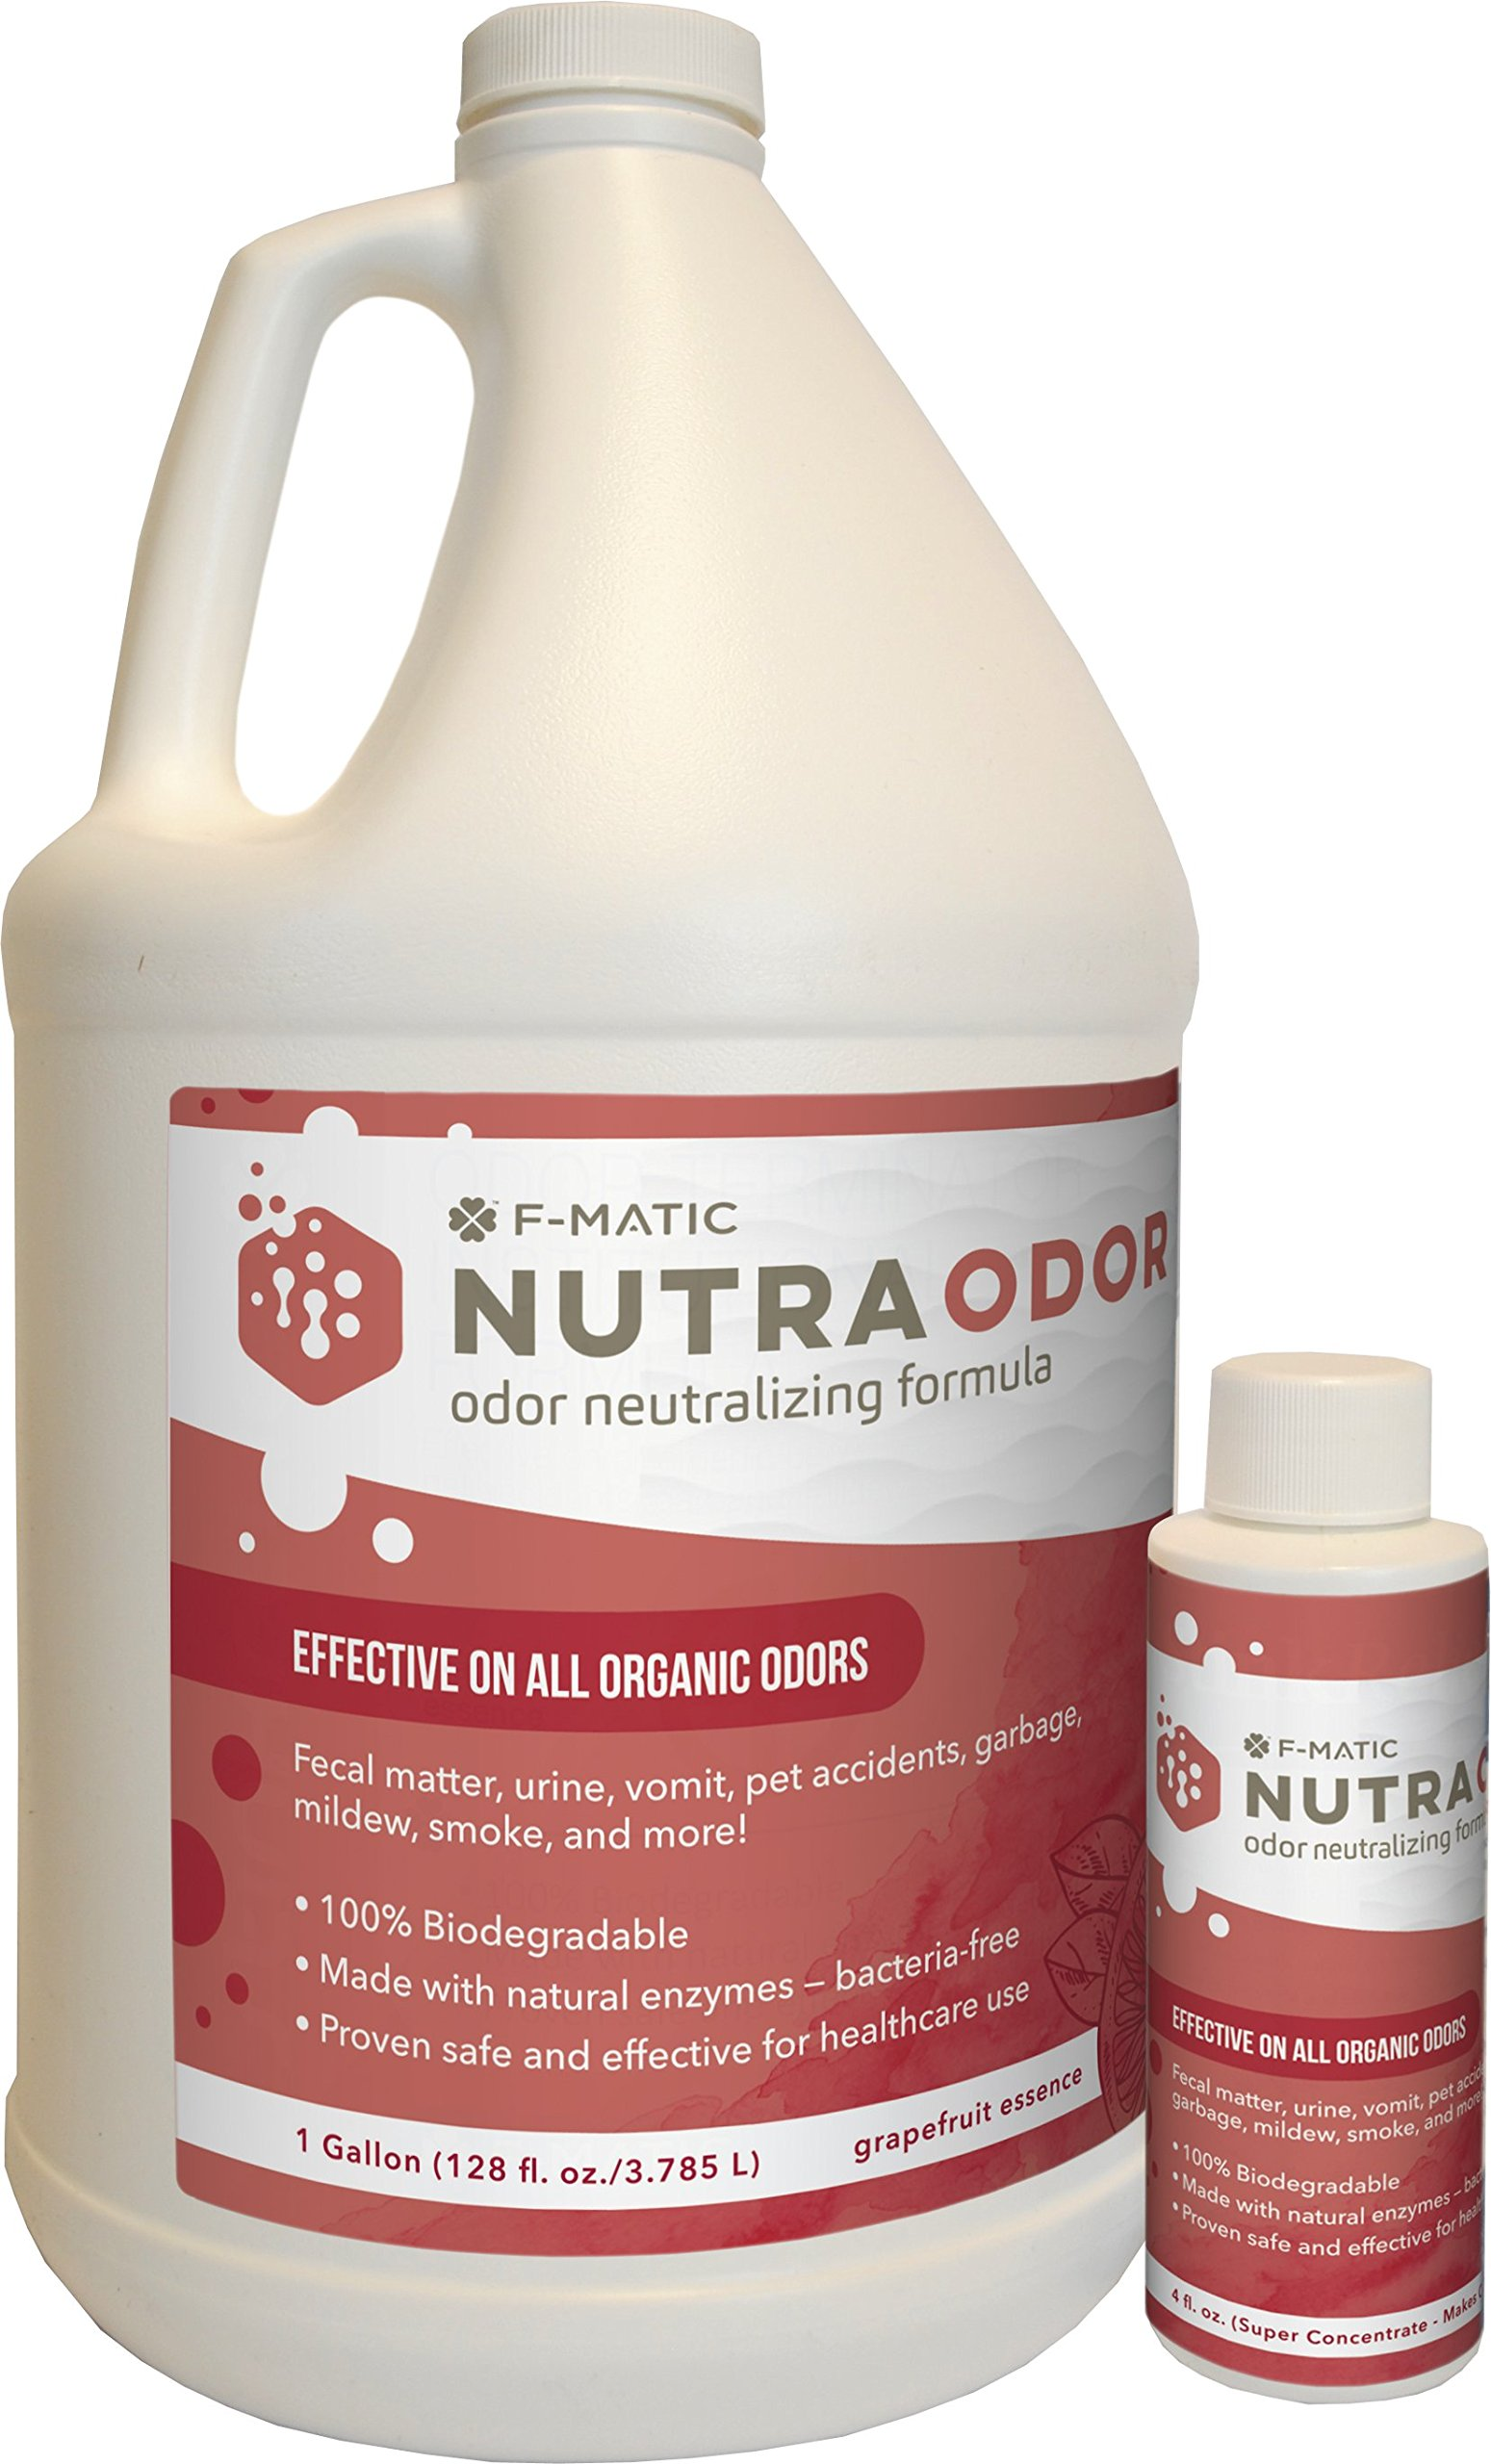 F-Matic Nutra Odor - Odor Neutralizing Formul, 4 oz Bottle